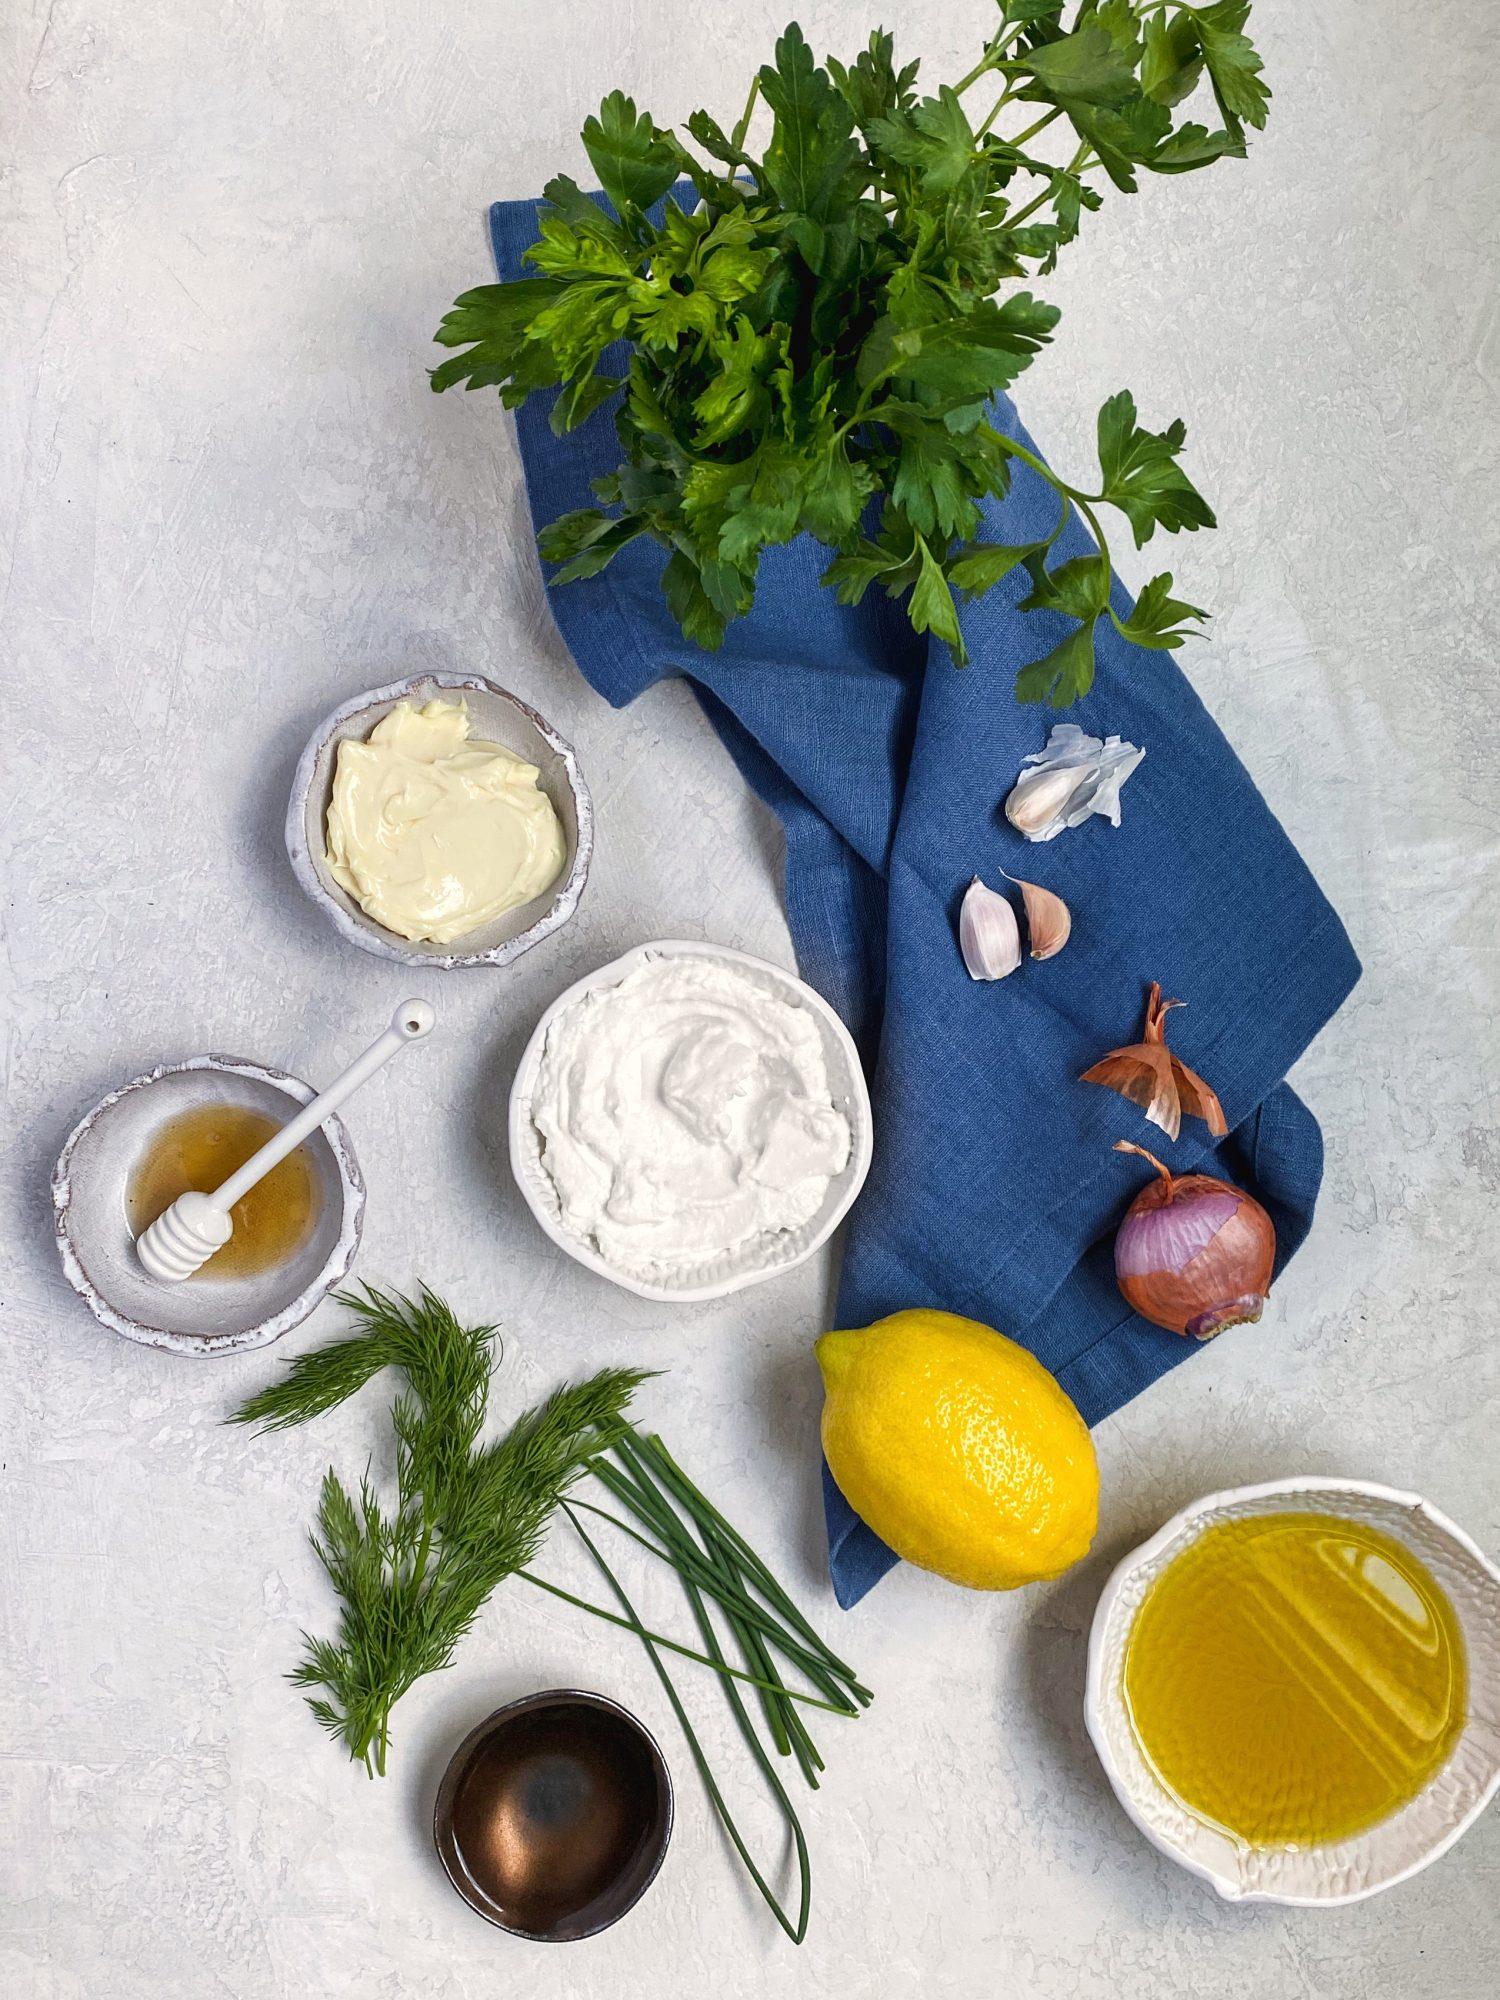 Creamy Herb Dressing made with yogurt